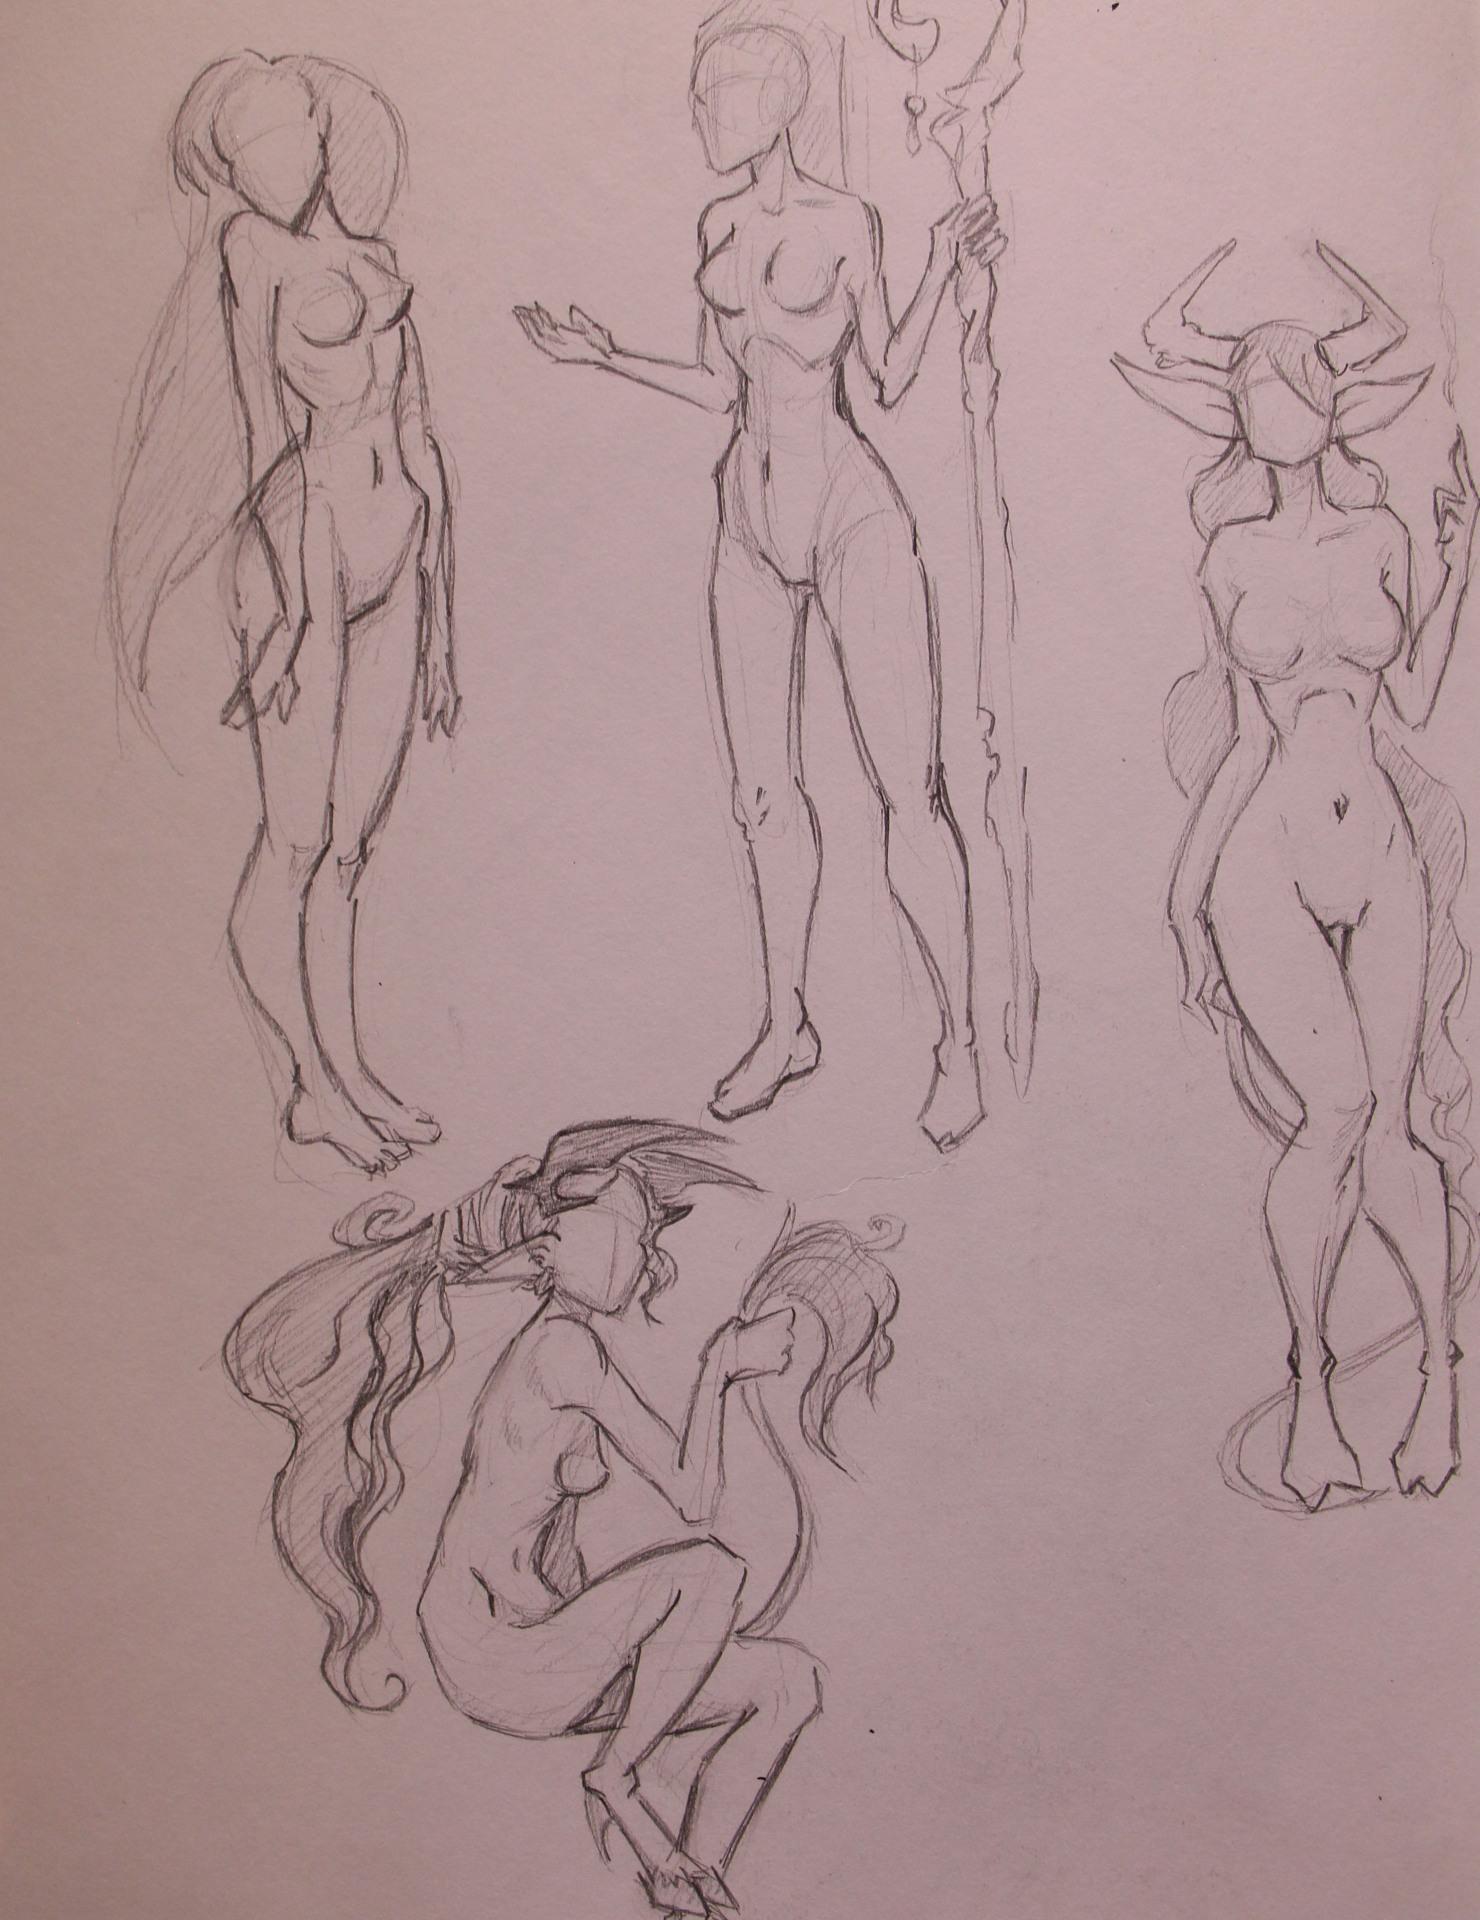 Anatomy Study - Female Poses Fantasy